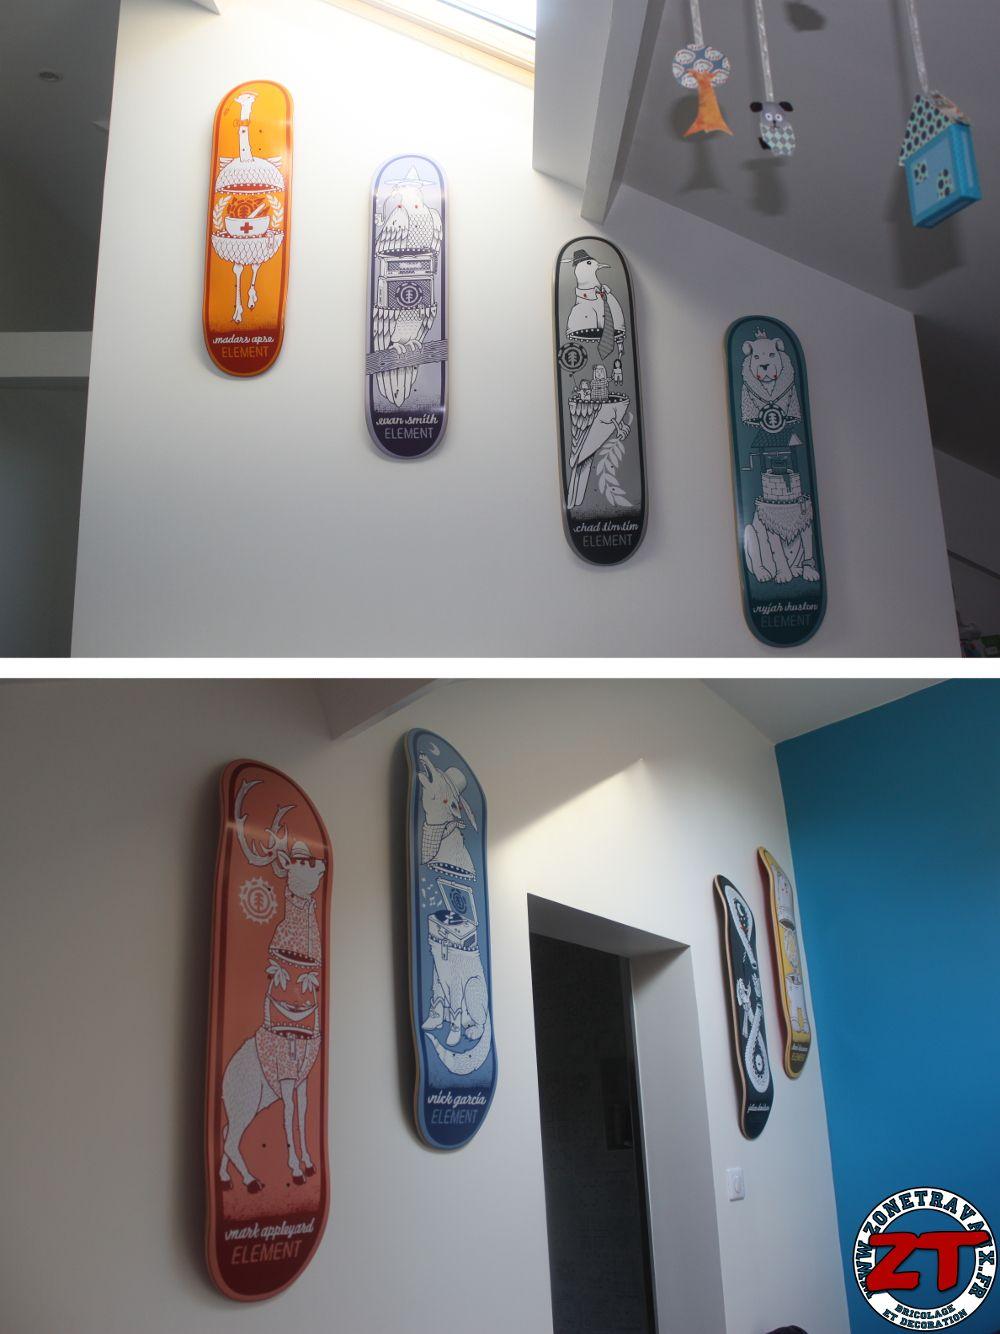 Set de 8 boards #Element - Collection #JeremyFish